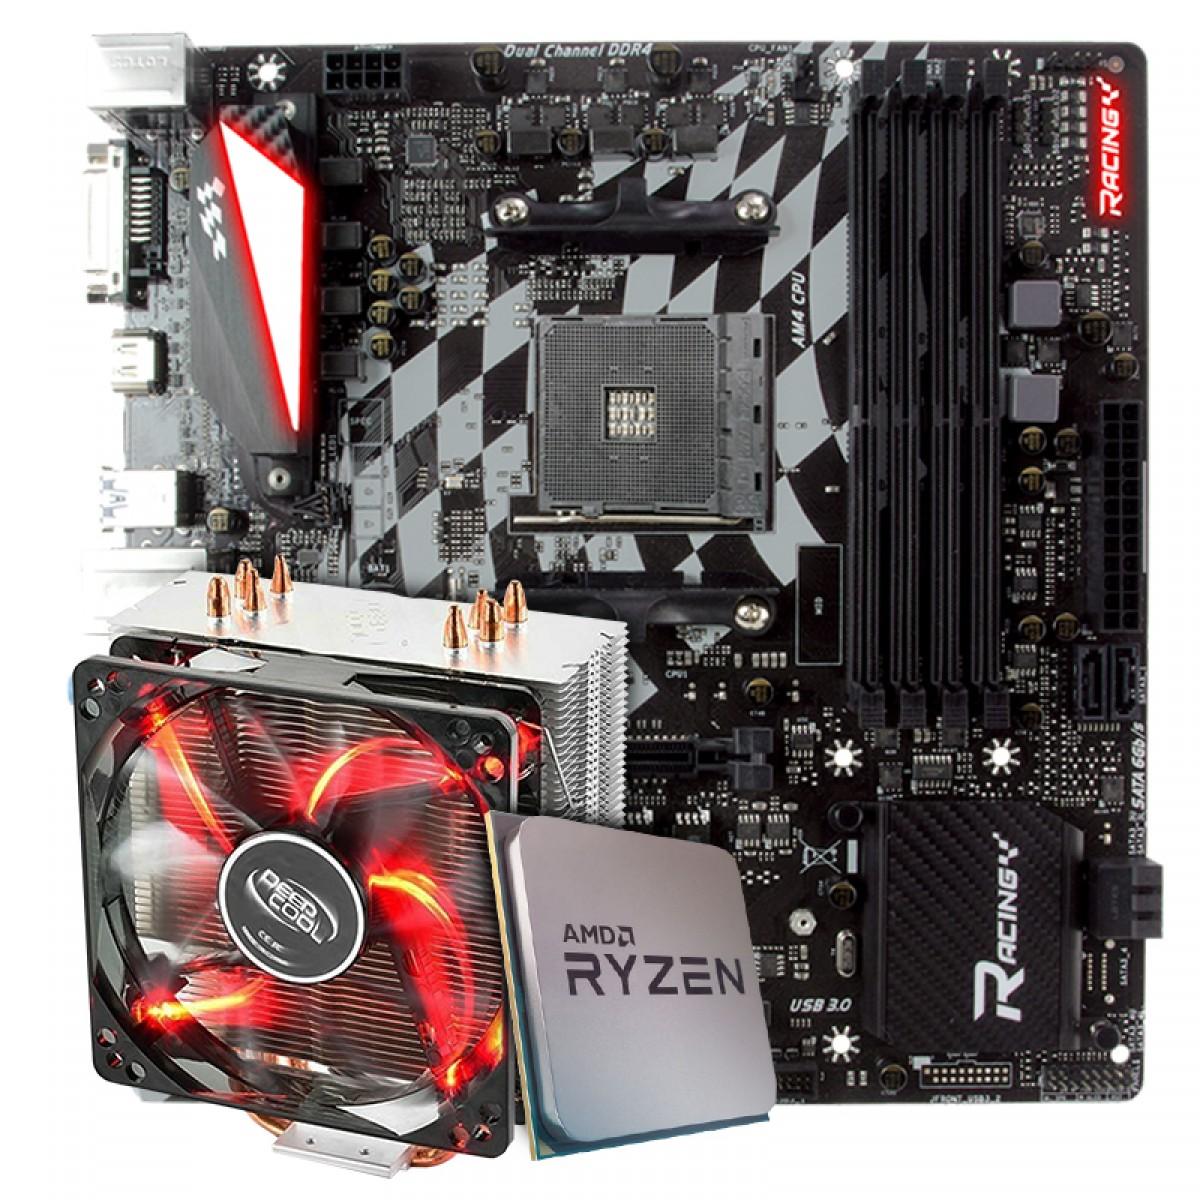 Kit Upgrade Placa Mãe Biostar Racing X470GTQ + Processador AMD Ryzen 9 3900x 3.8GHz + Cooler DeepCool Gammaxx 400